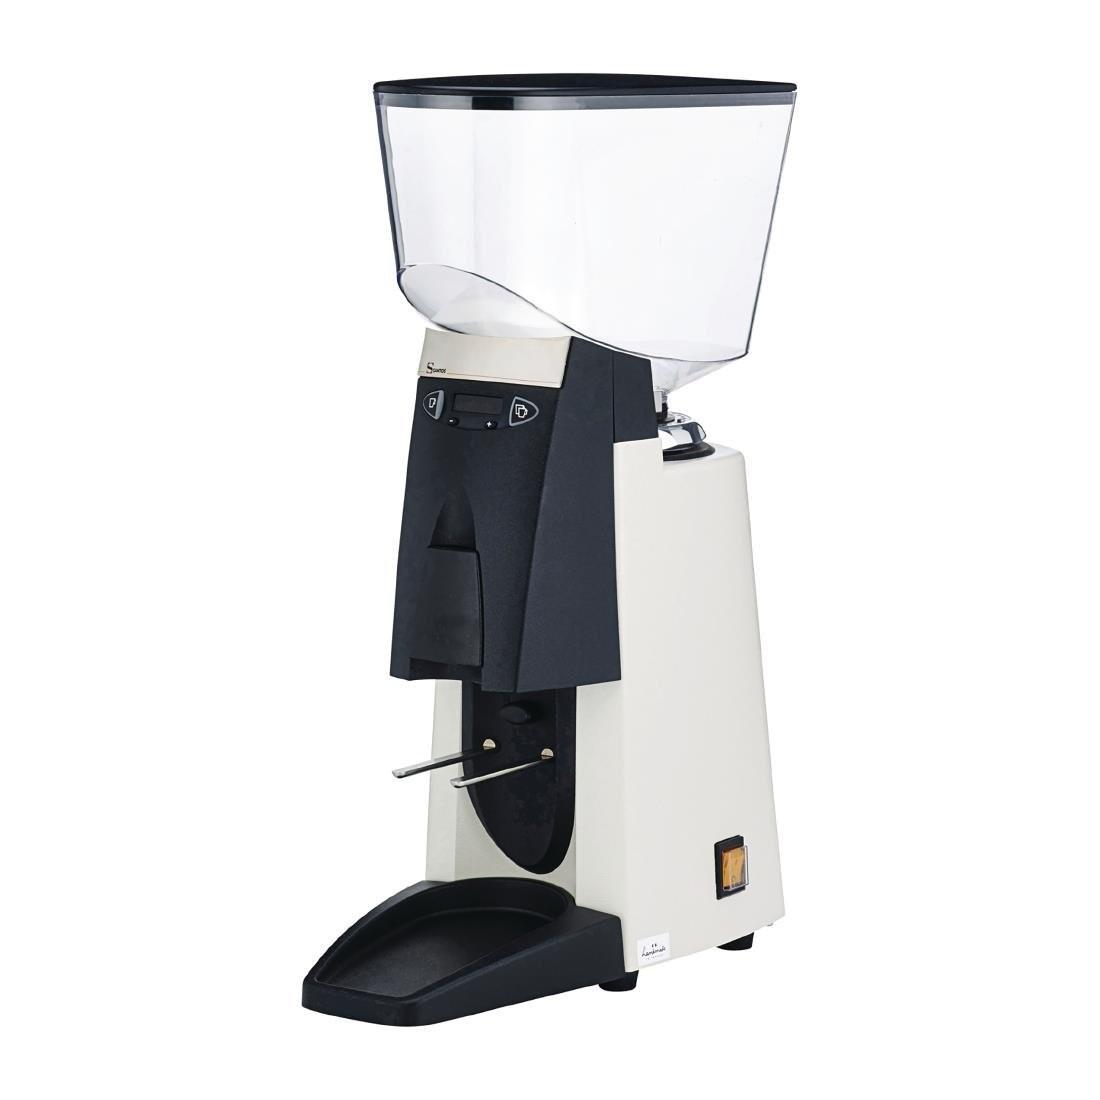 Santos 55WA Barista Silent Espresso Coffee Grinder White Capacity 2.2kg - CP768